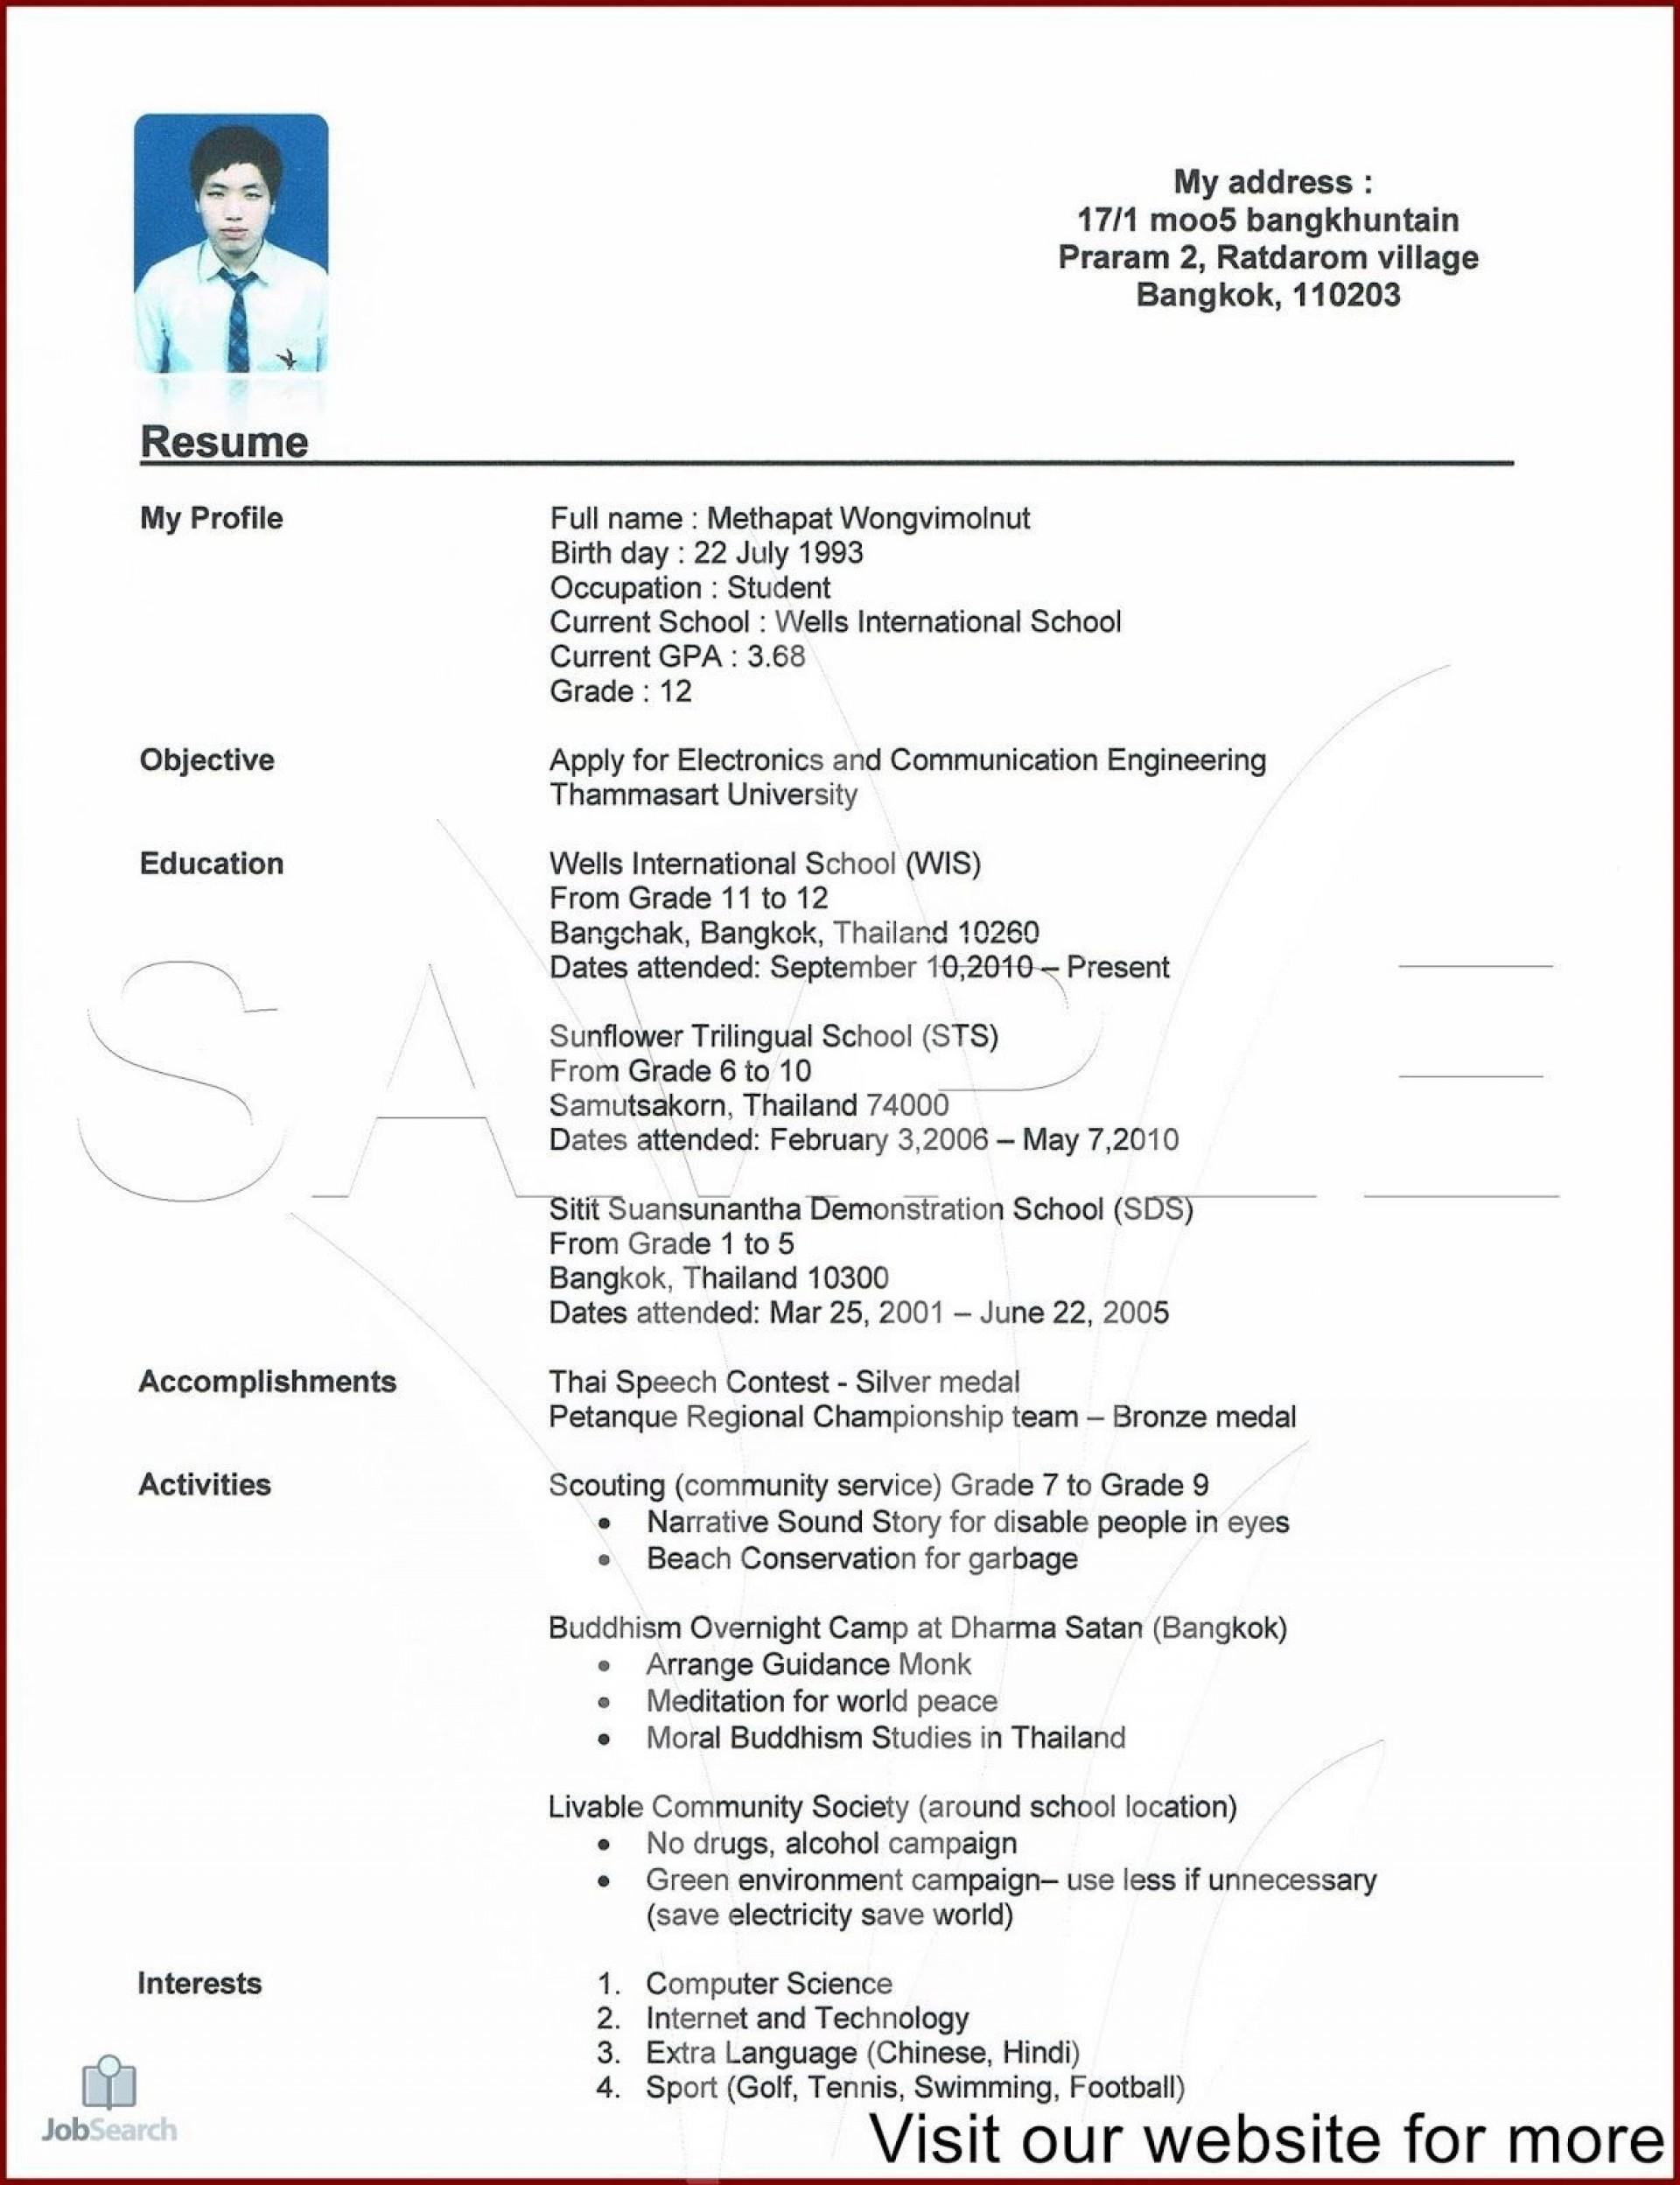 002 Unique Professional Cv Template Free Online Idea  Resume1920